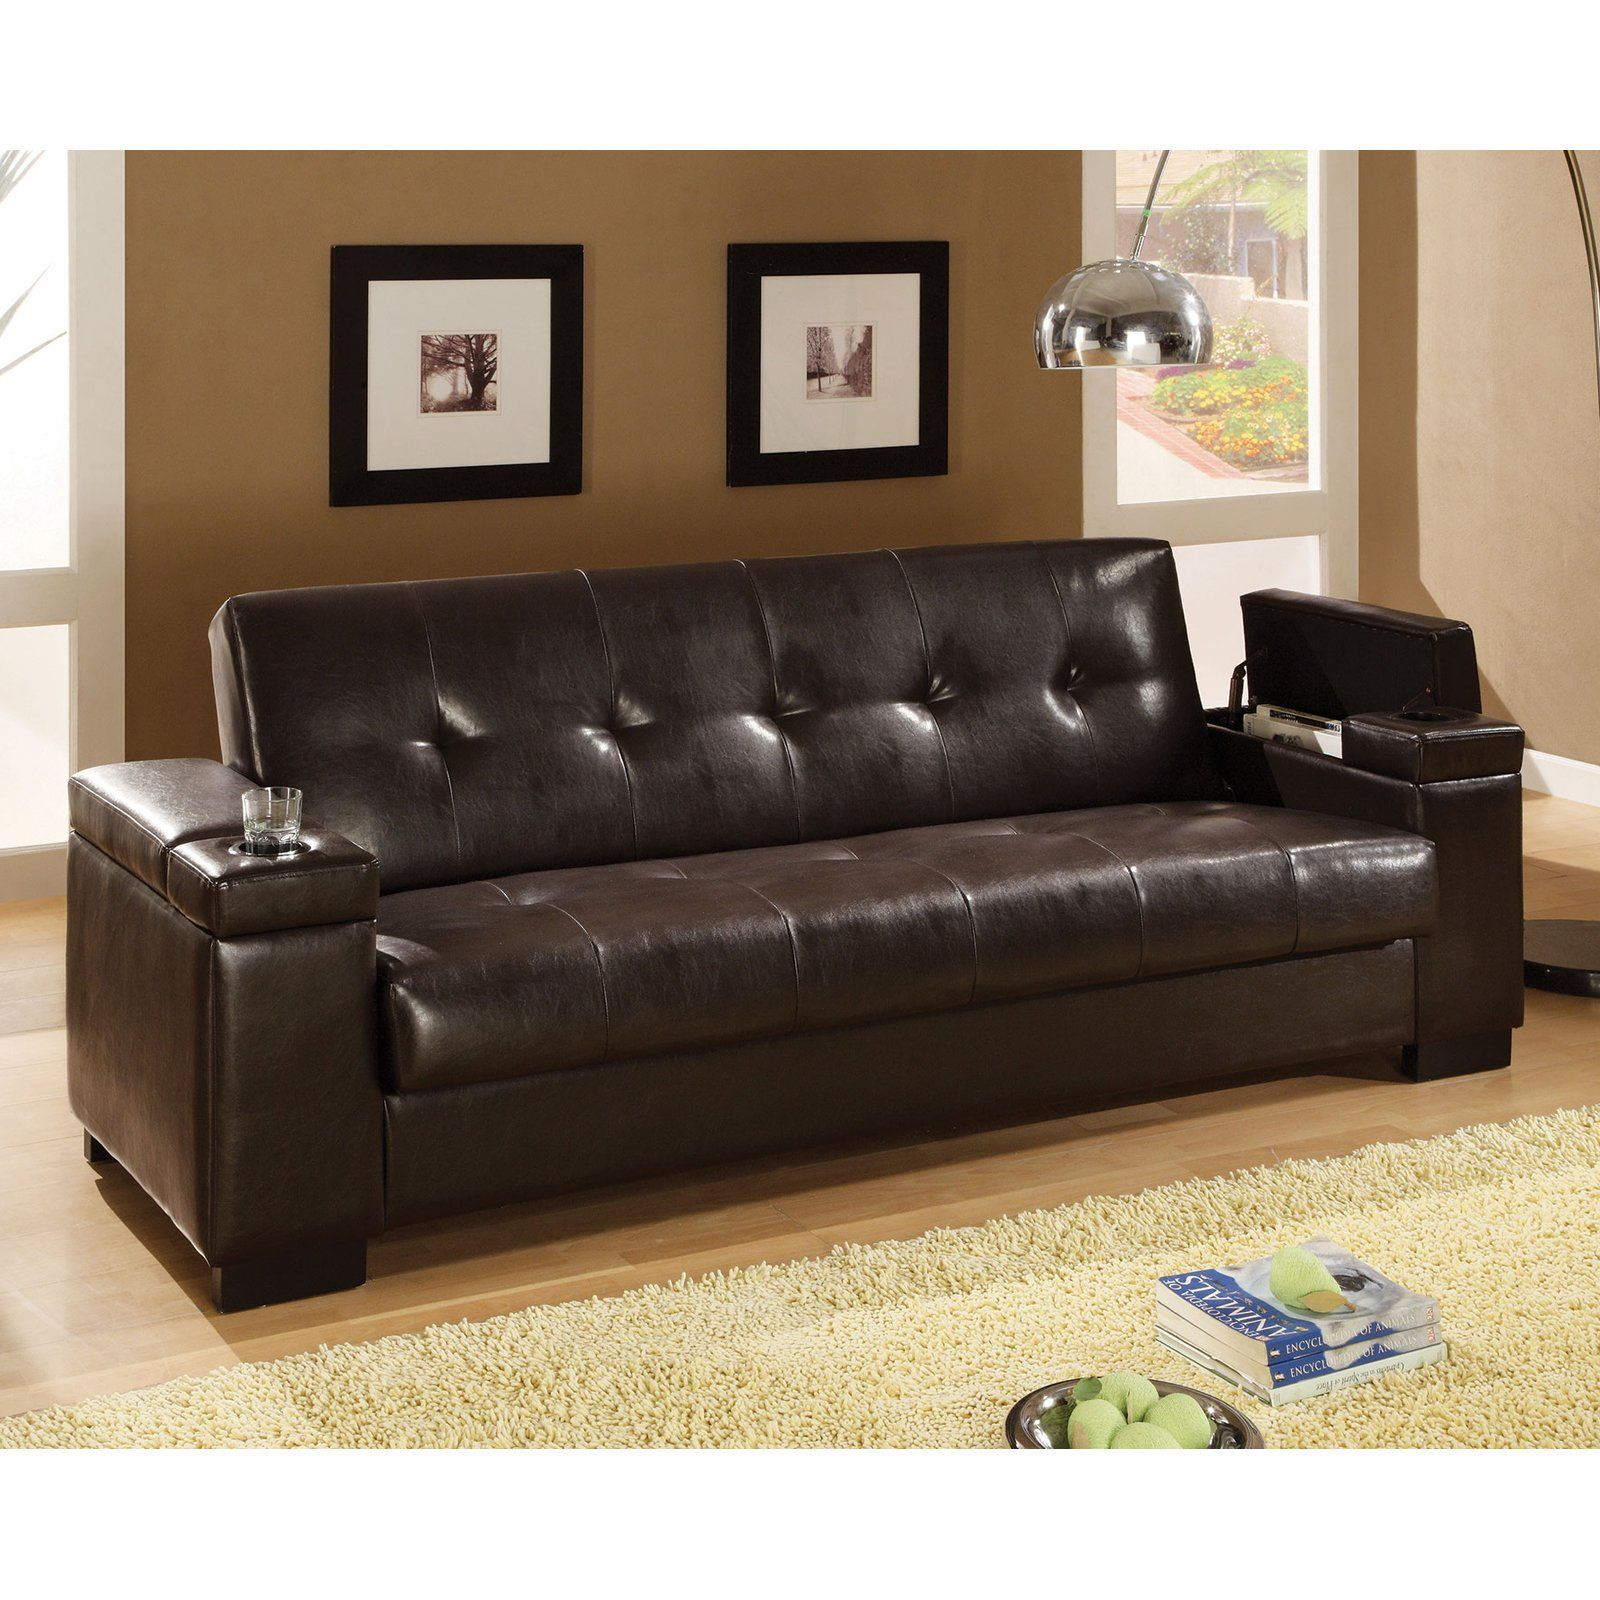 Coaster bingen convertible sofa products pinterest